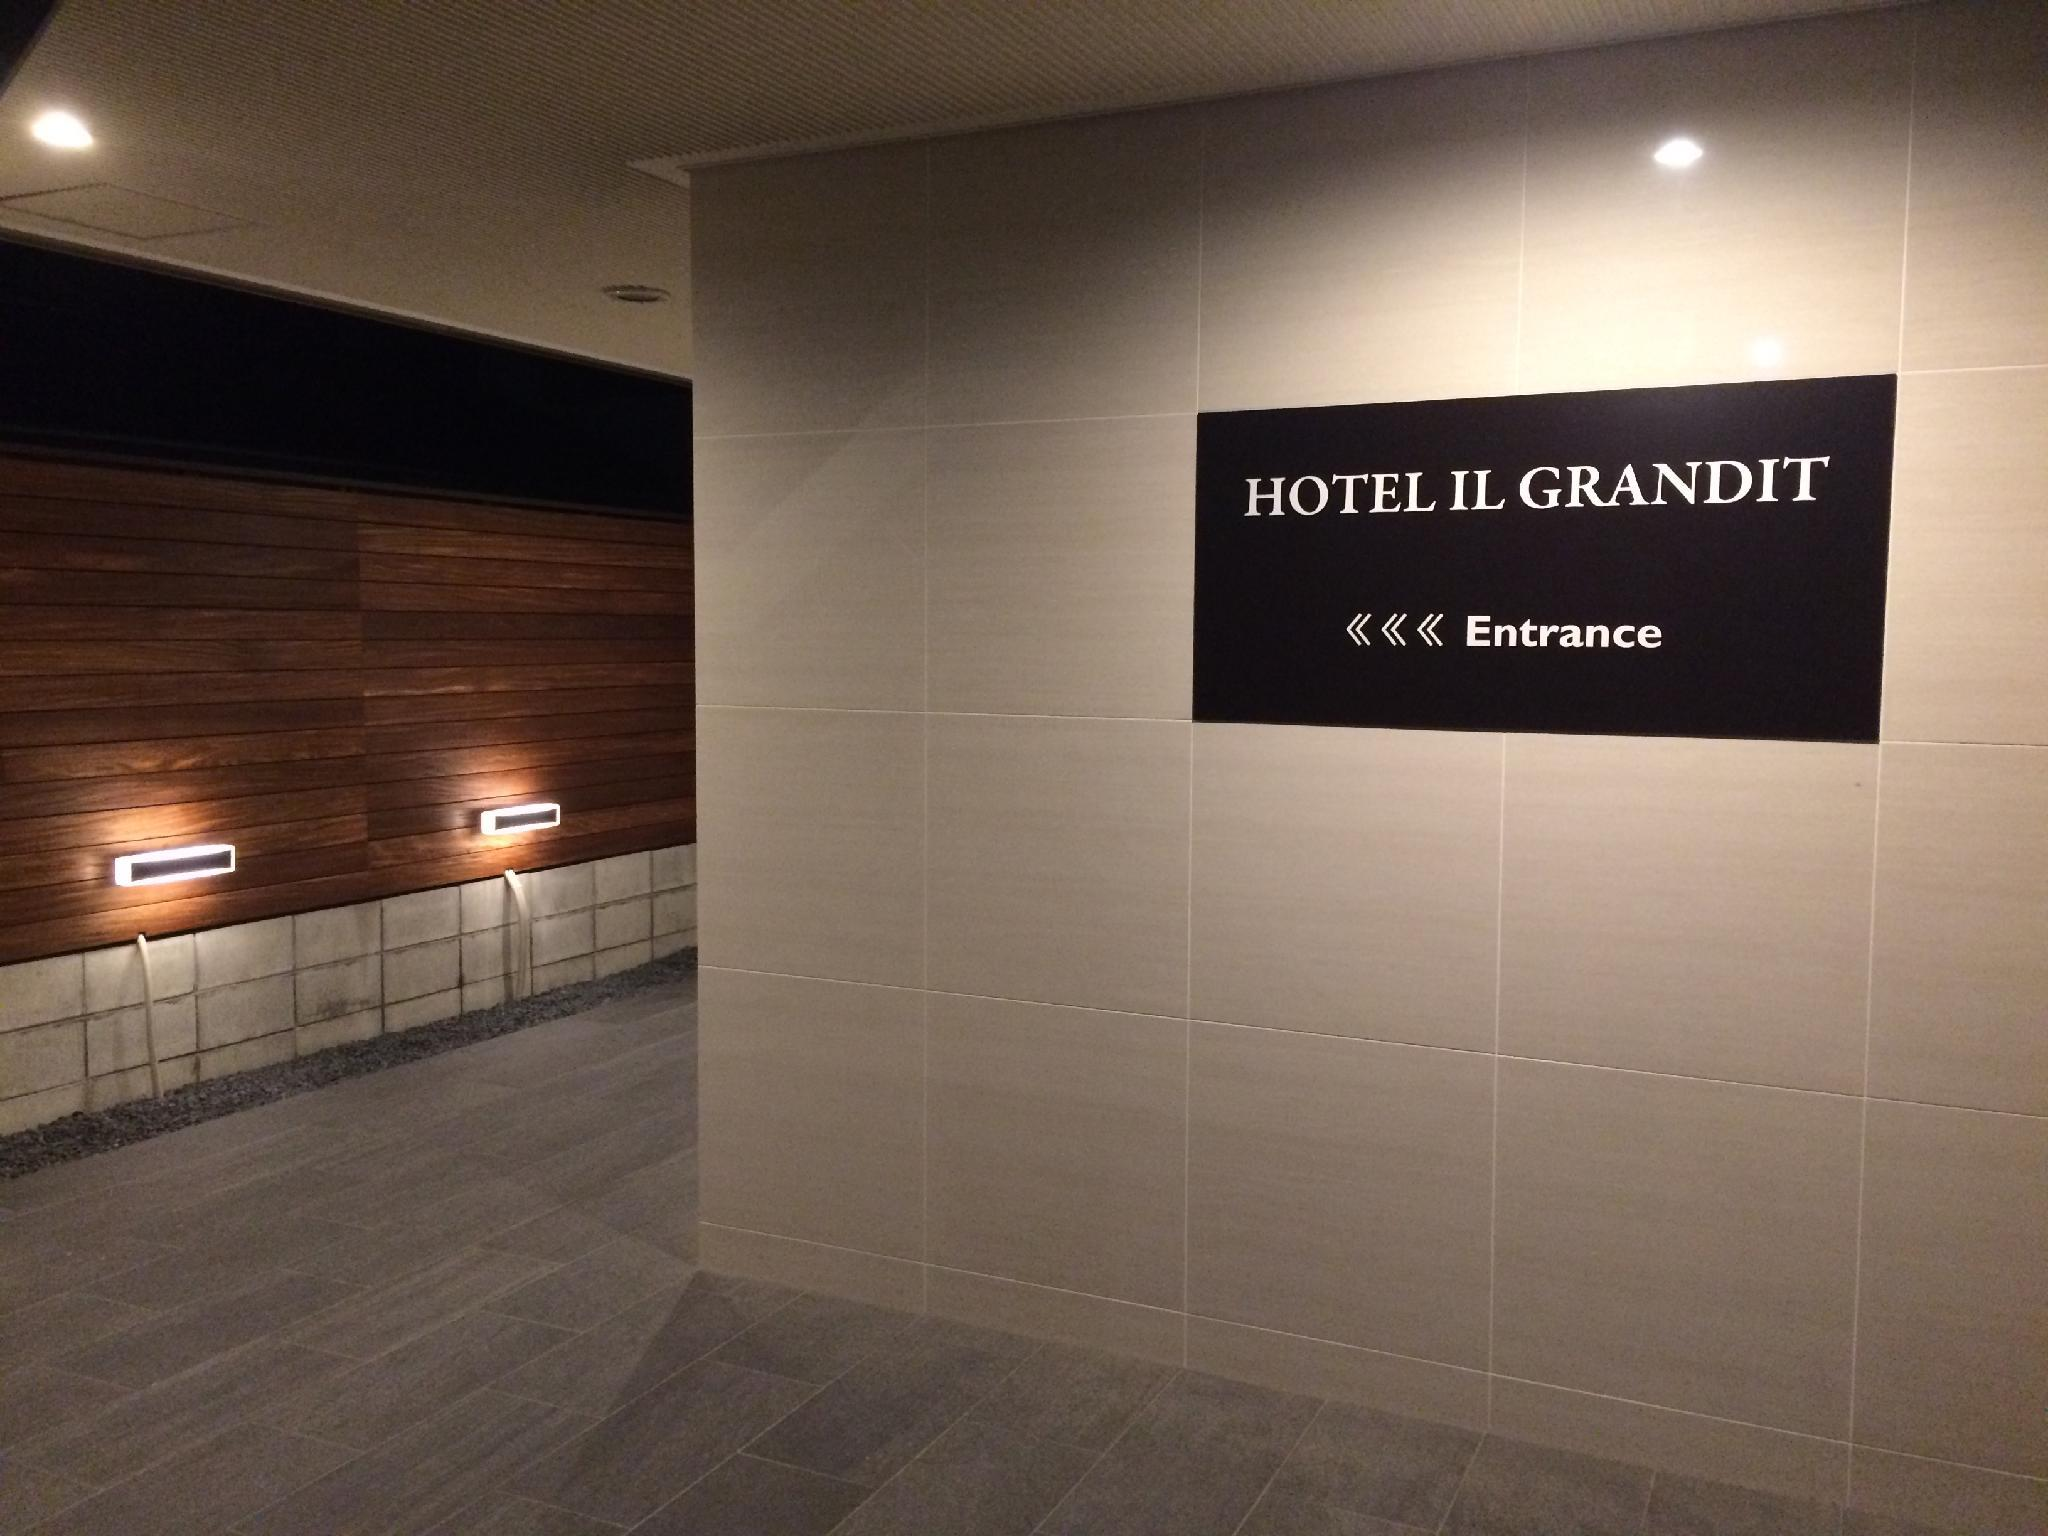 HOTEL IL GRANDIT, Sakai